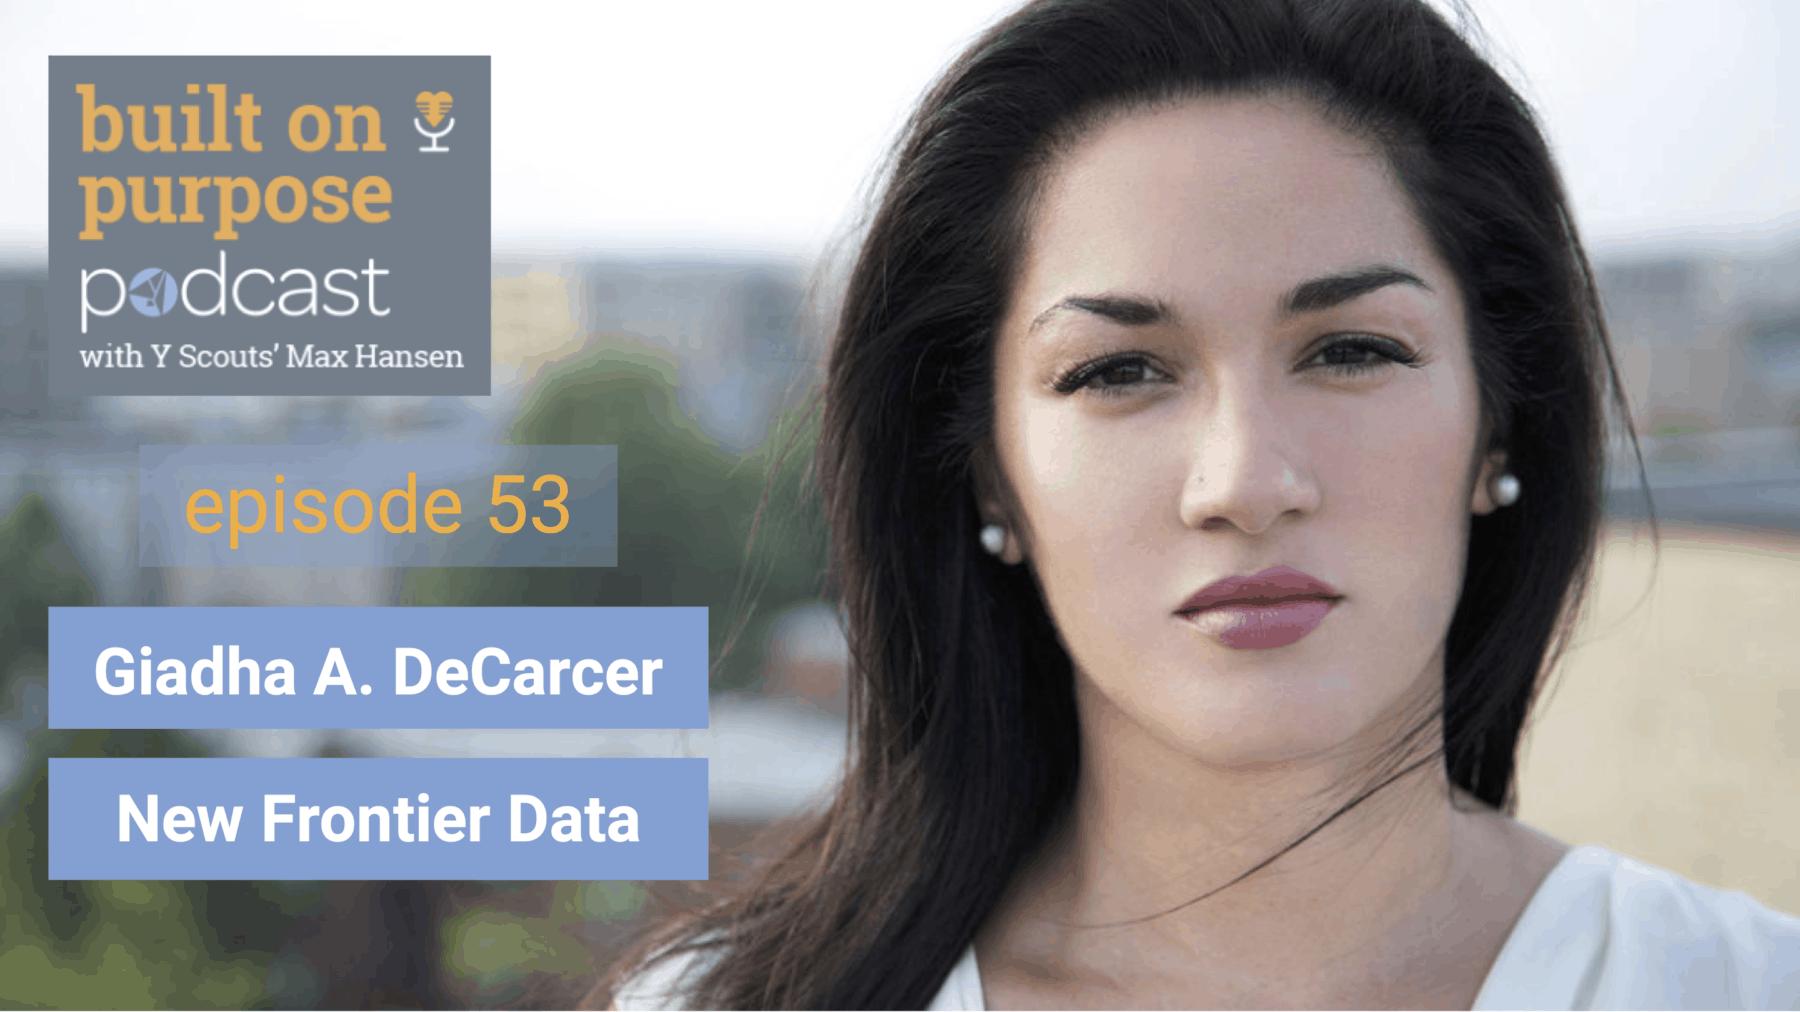 Episode 53 - Giadha A. DeCarcer - New Frontier Data